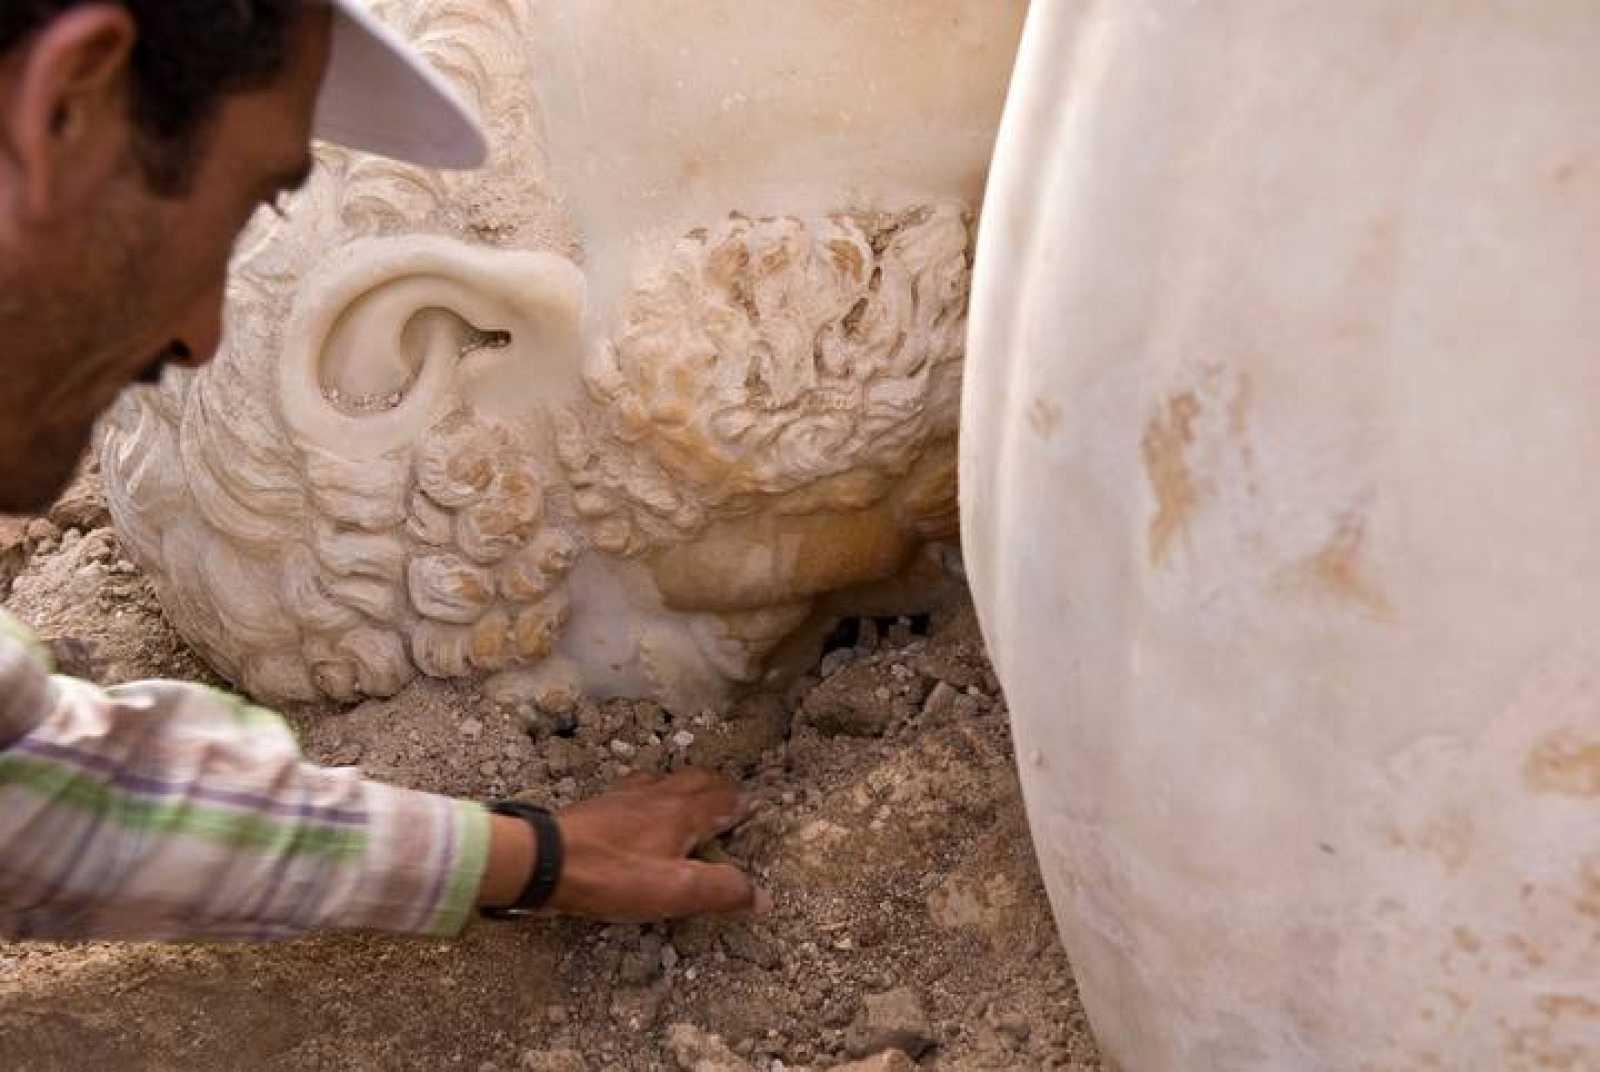 La colosal estatua de Marco Aurelio.